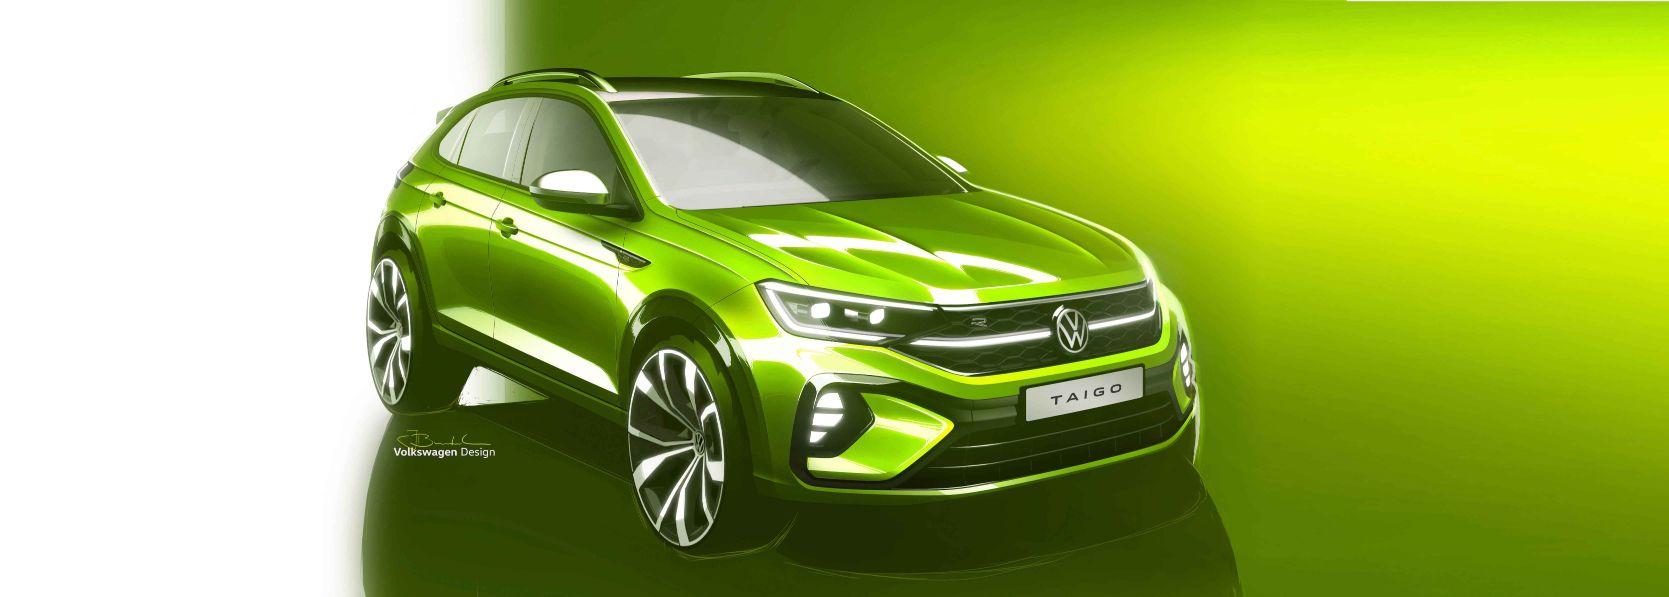 Volkswagen Taigo headed to SA